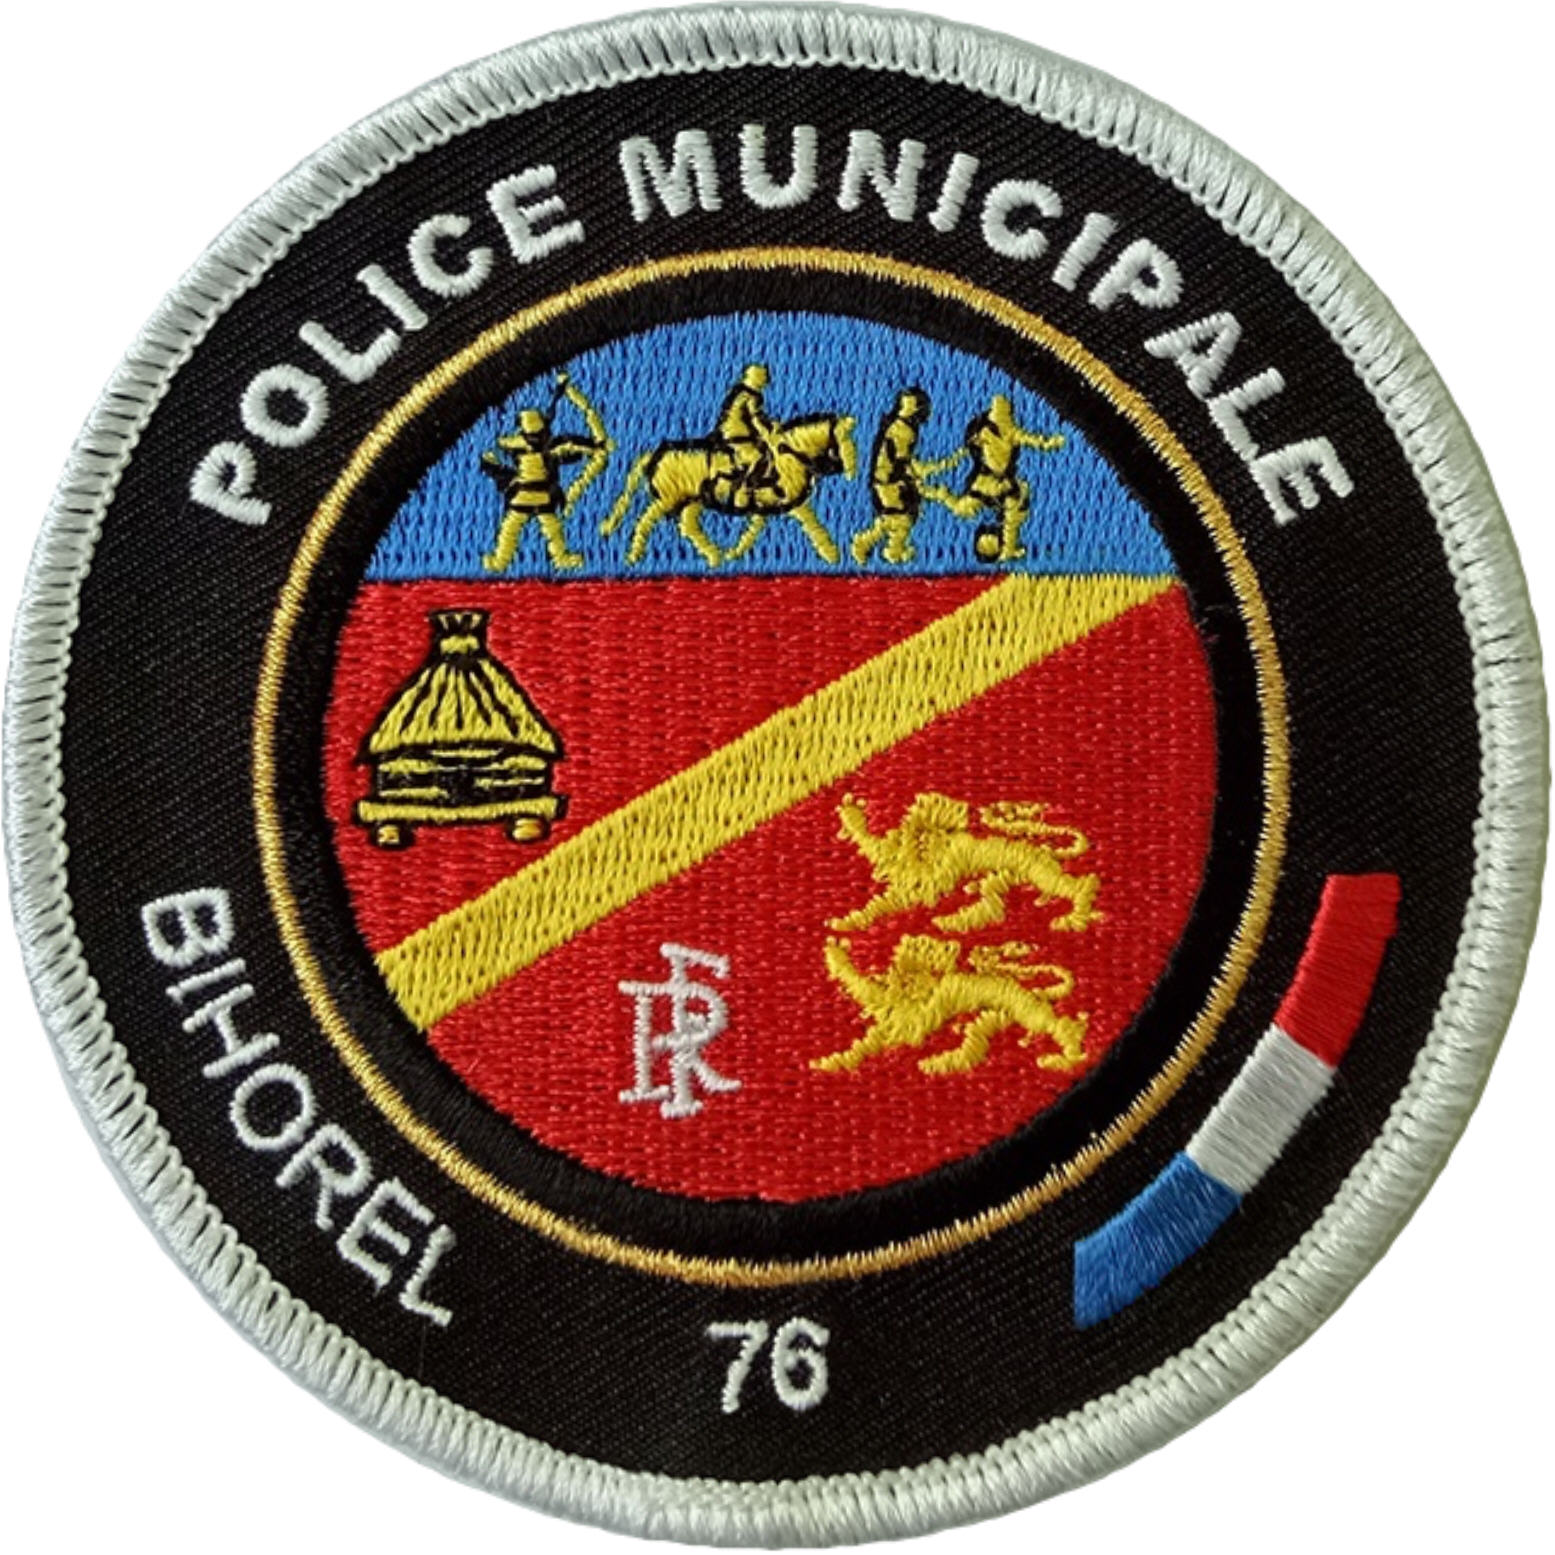 ÉCUSSON POLICE MUNICIPALE BIHOREL